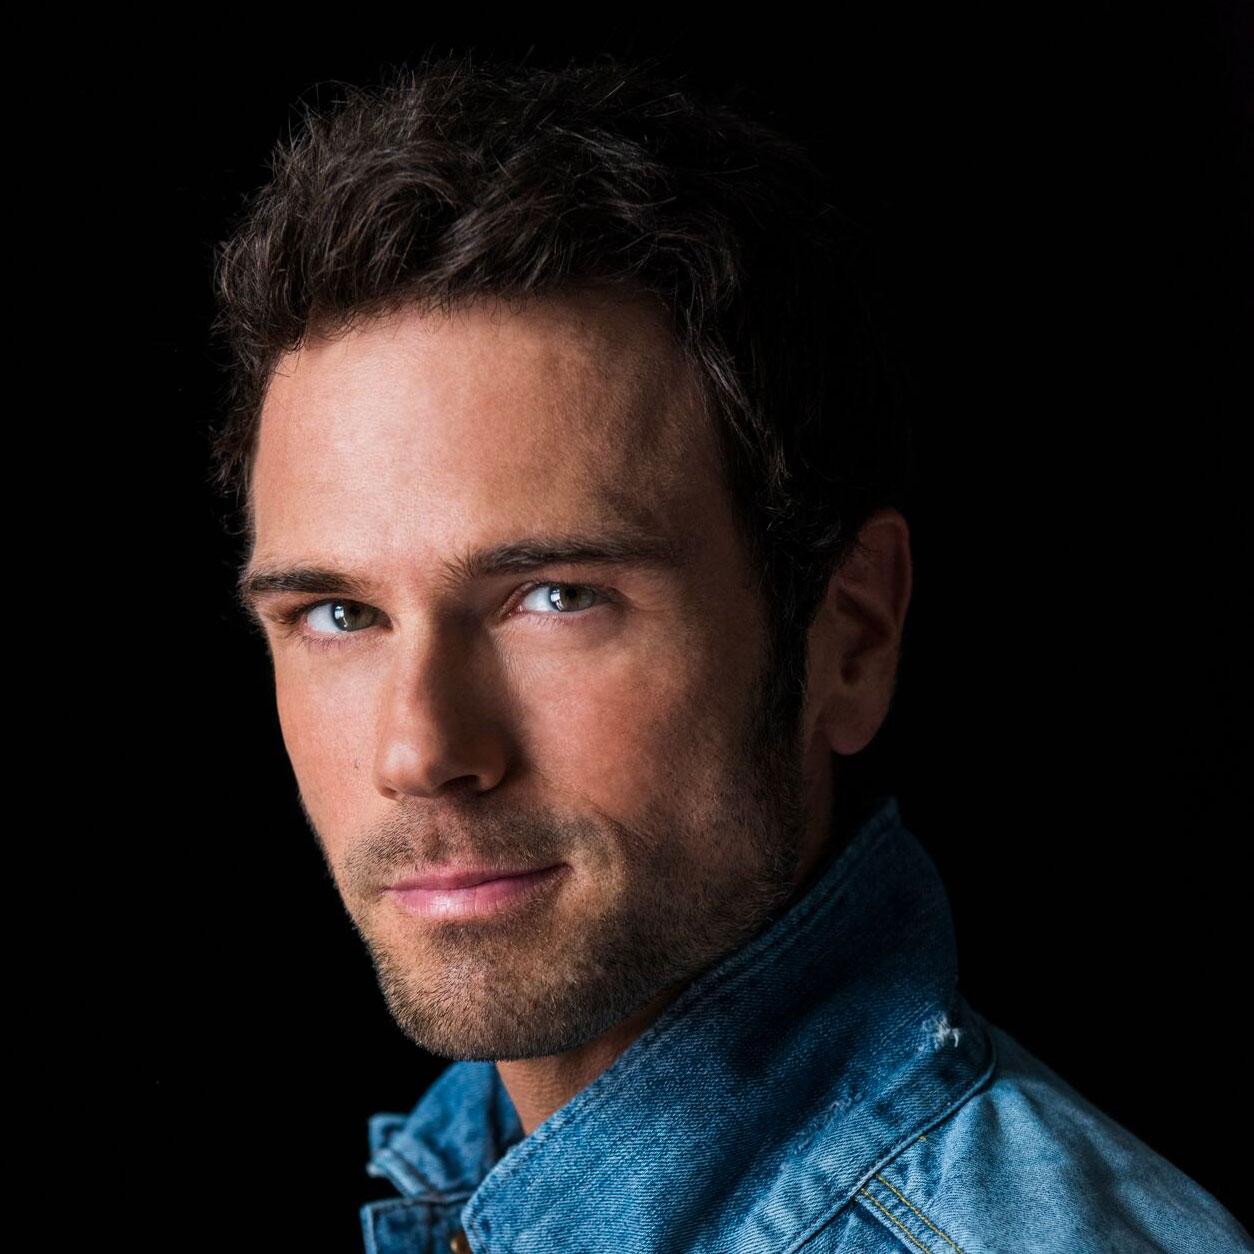 Custom WordPress web design and managed hosting for Nashville Country Music artist Chuck Wicks.